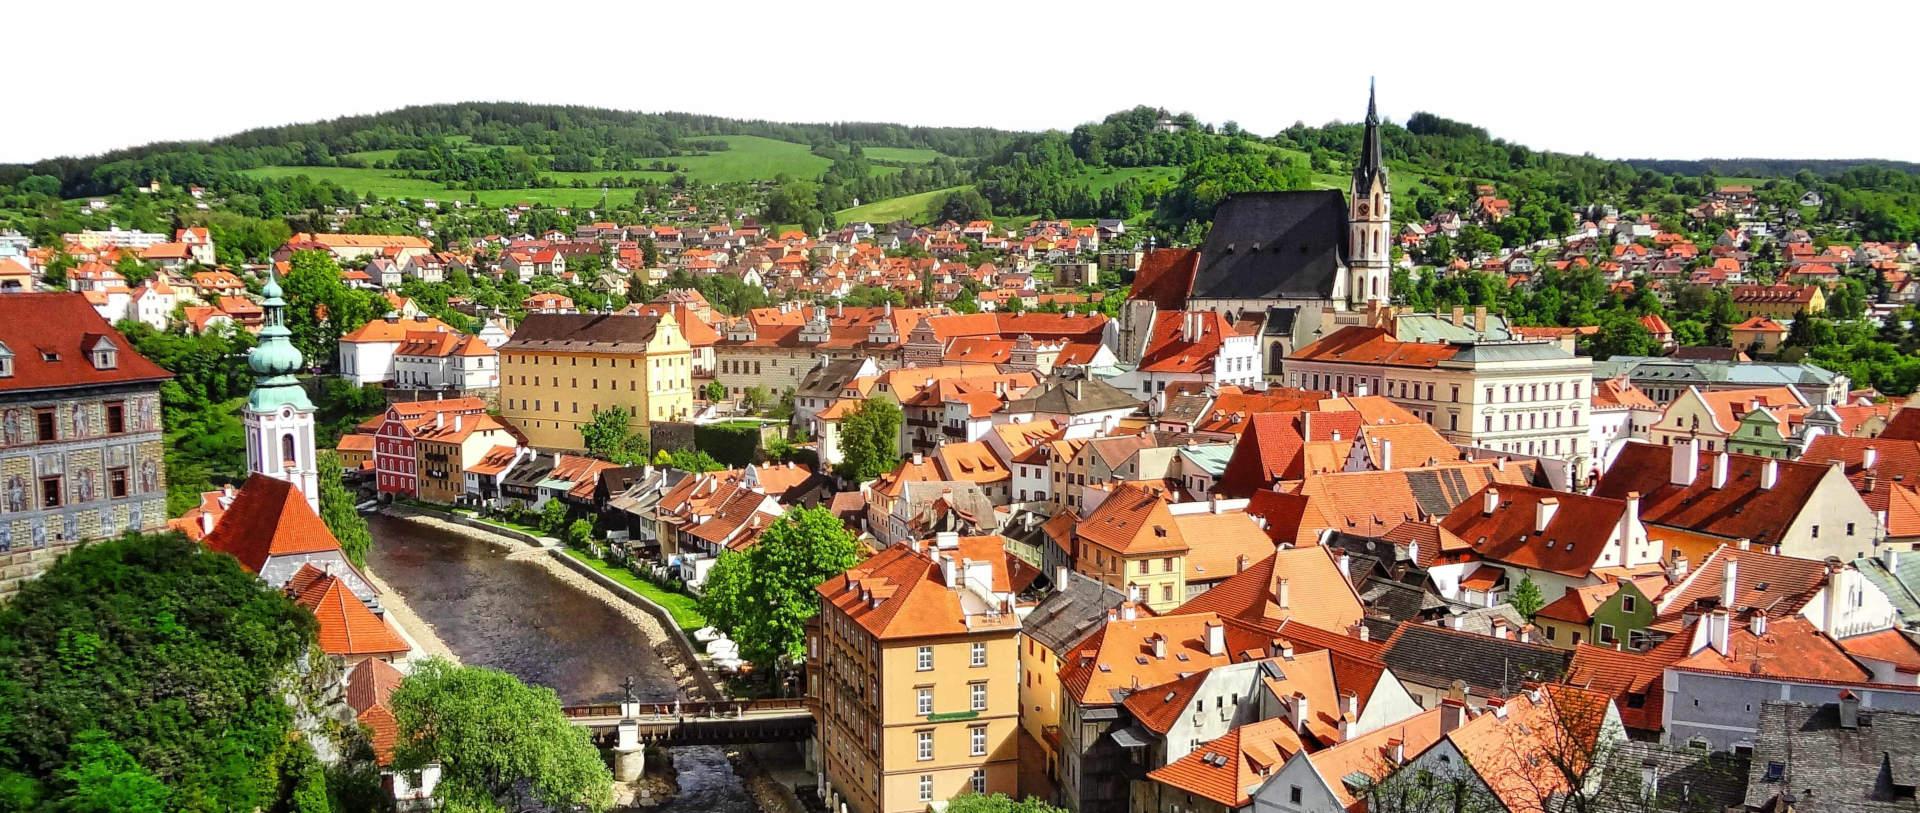 Custom-Travel-Planner-Network-Czech-Republic-Cesky-Krumlov-